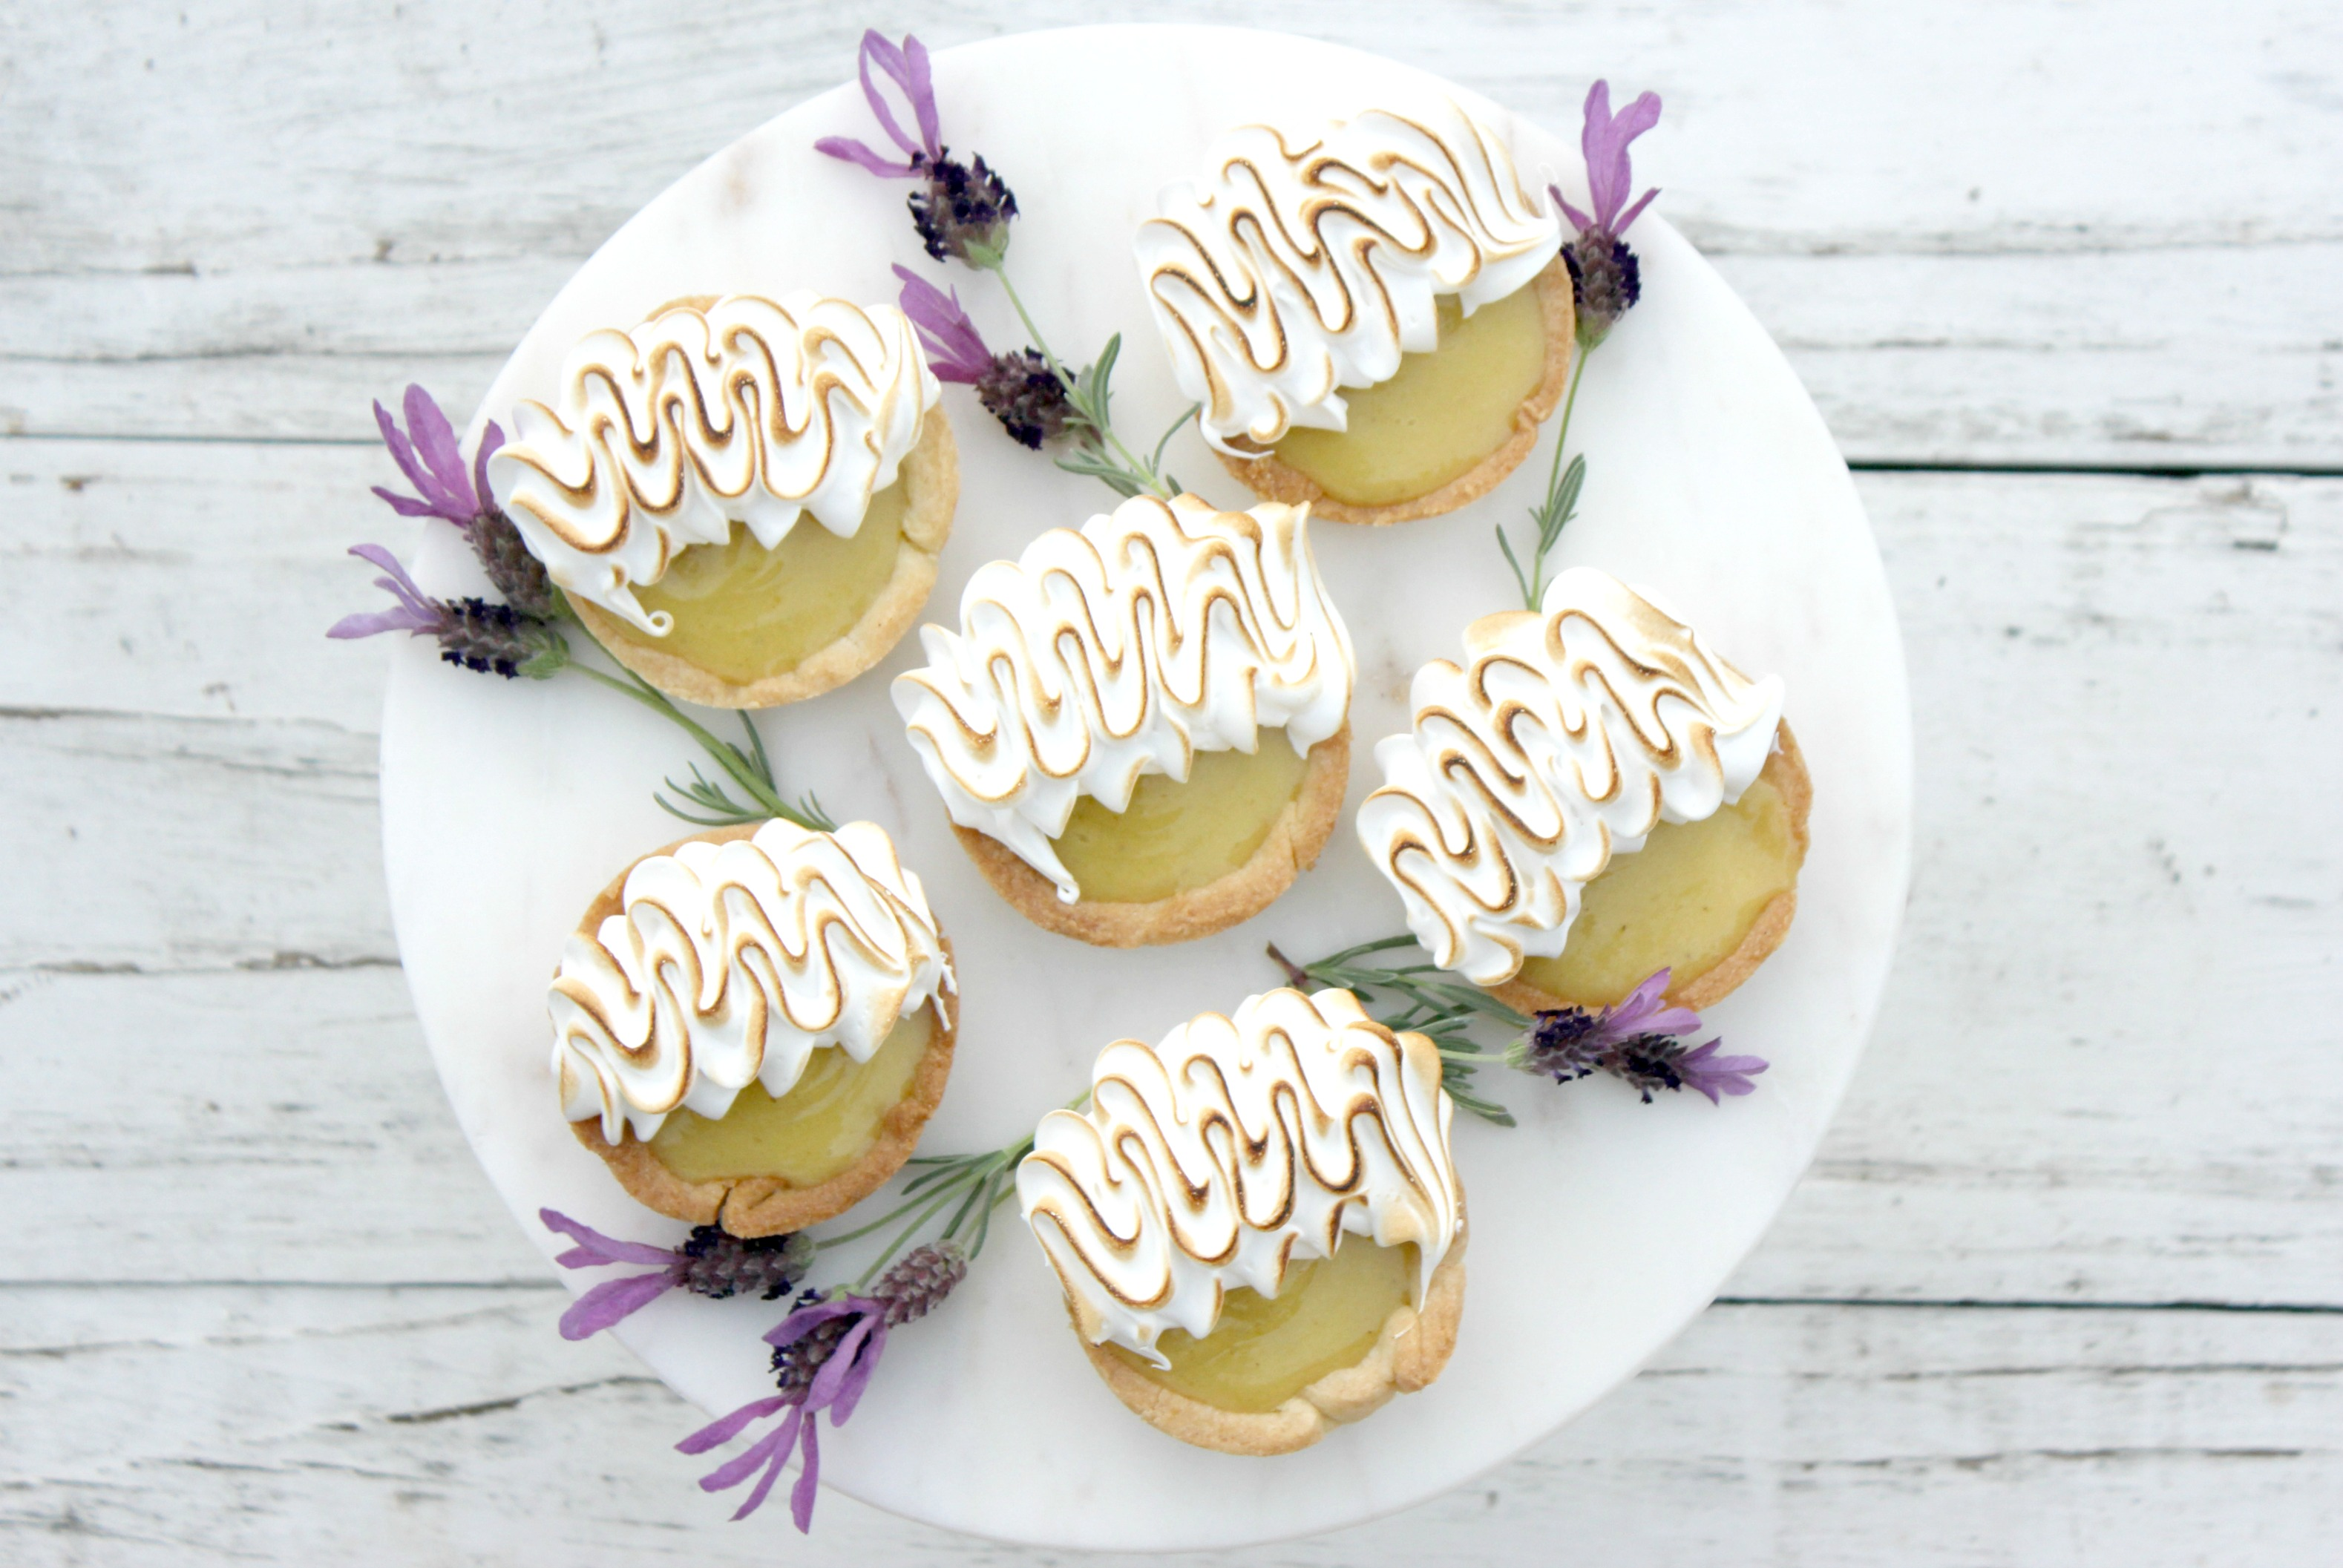 Lemon Lavender Tarts